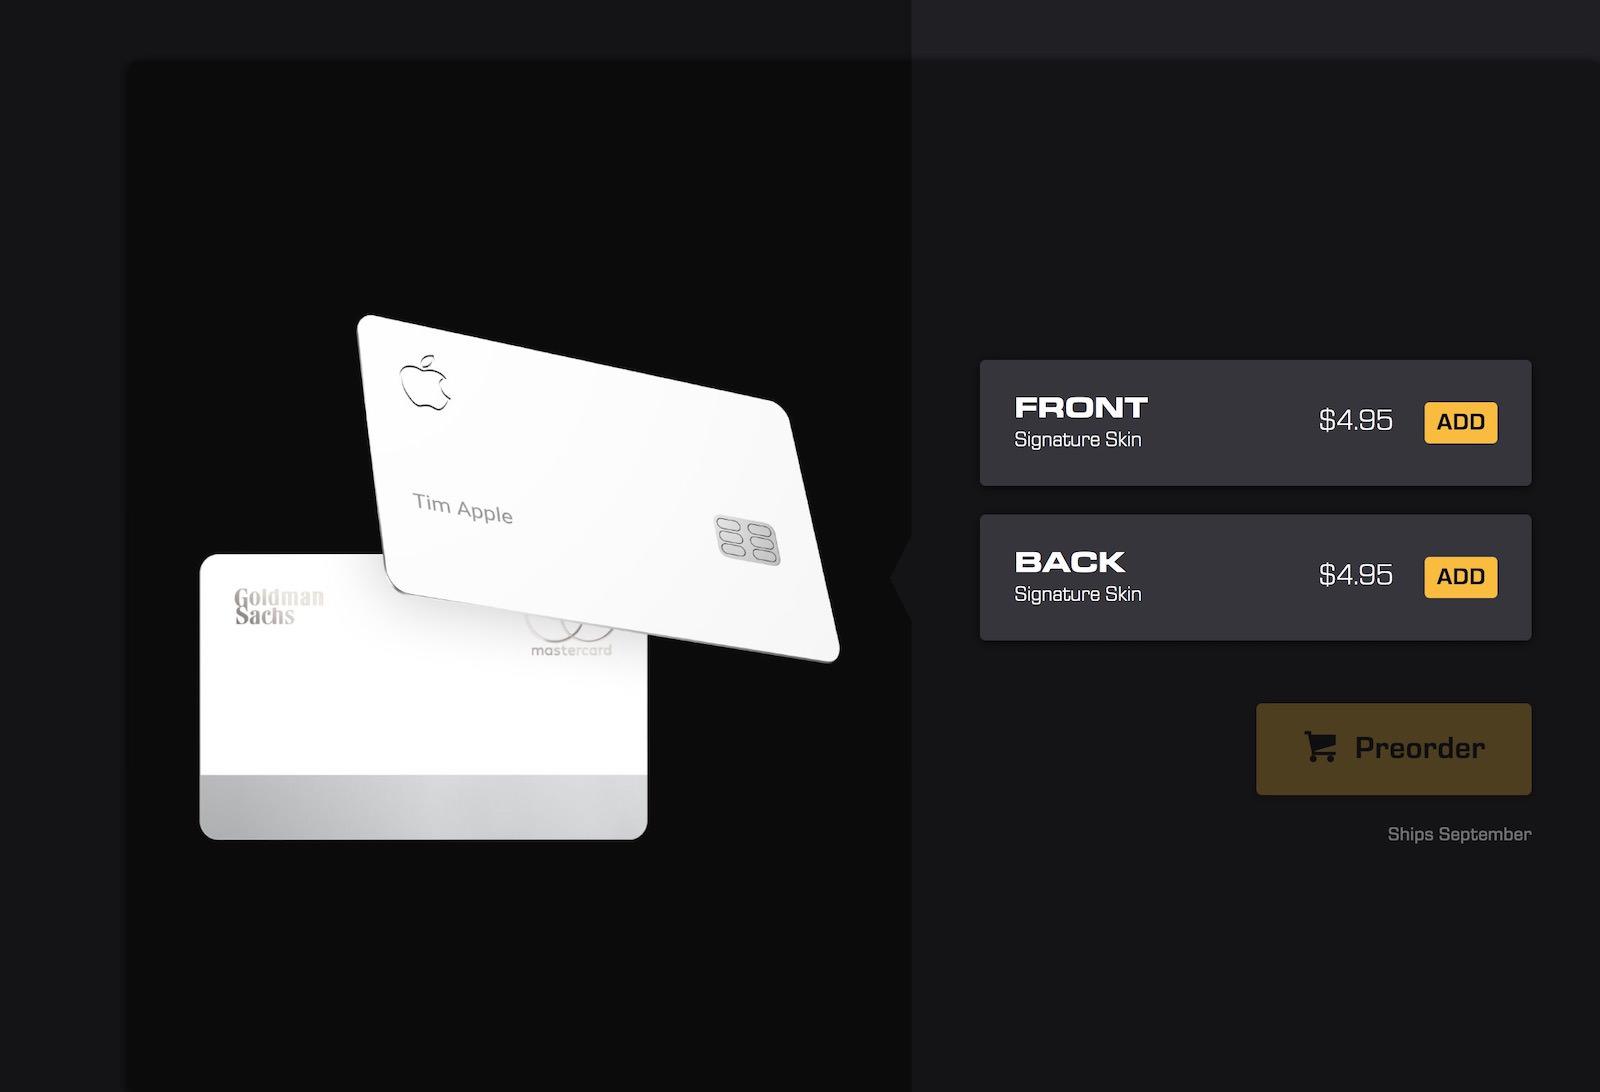 Apple Card dbrand skin